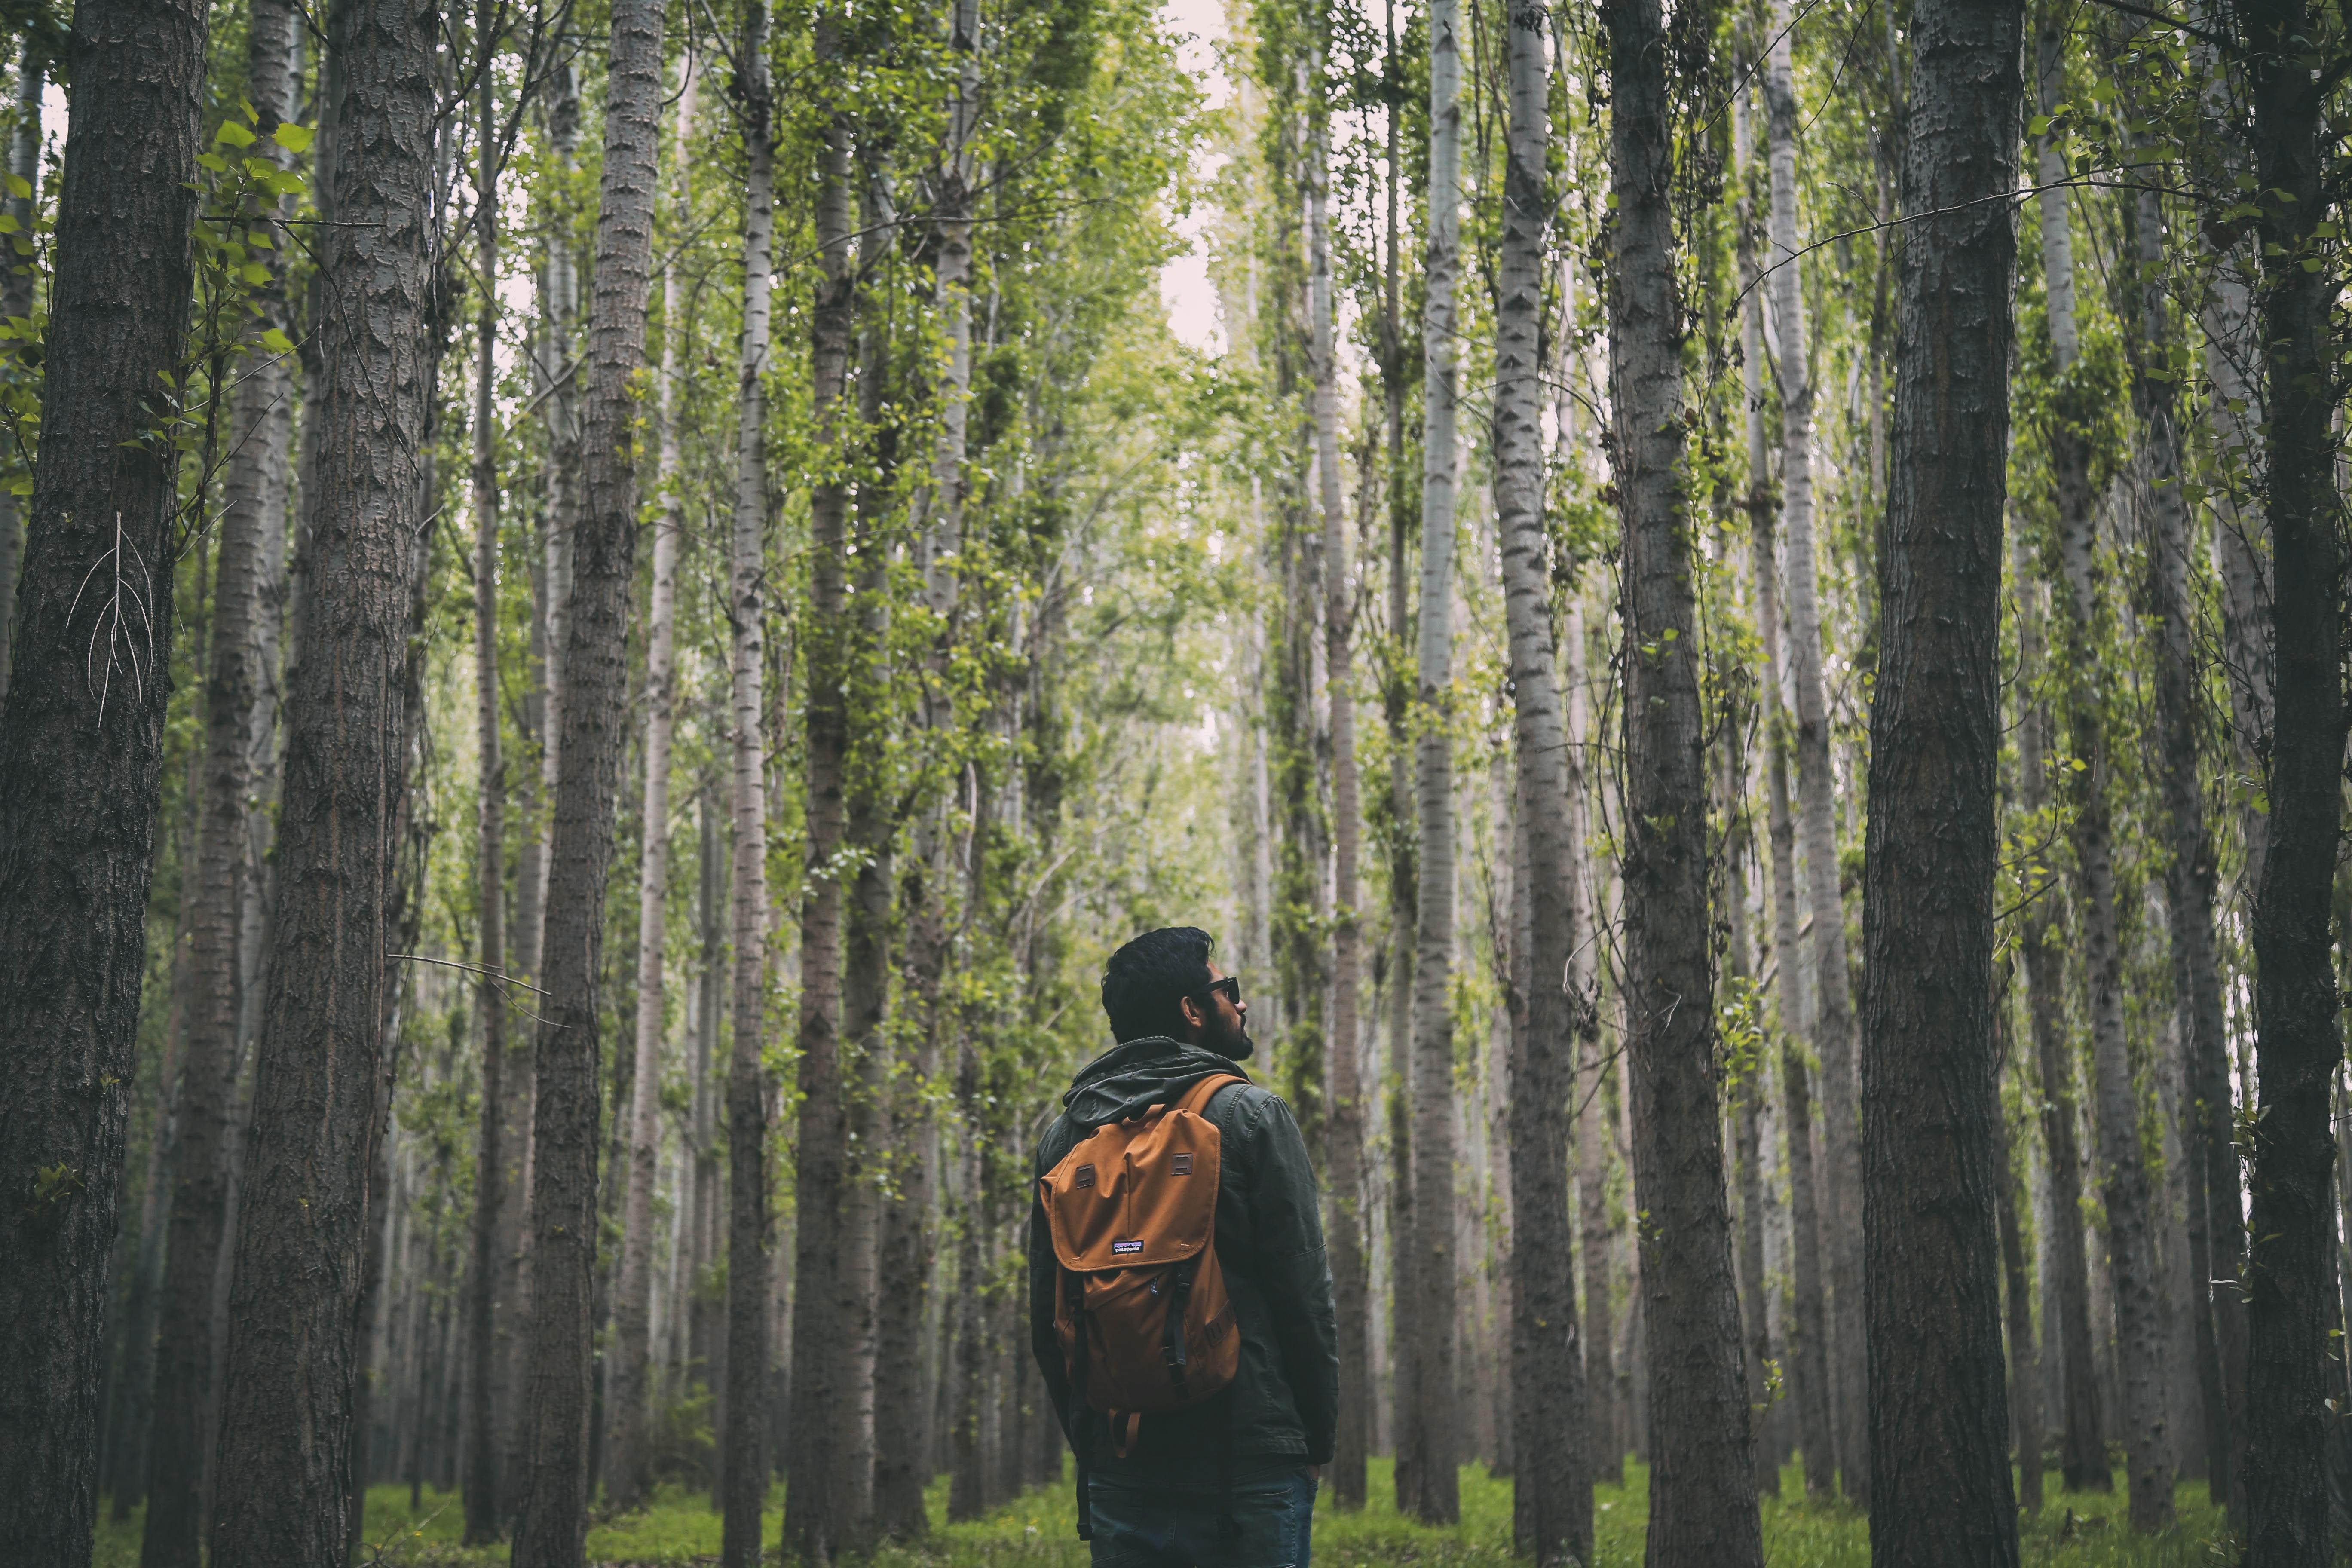 Orange Backpack, Adventure, Hiking, Trees, Sunglasses, HQ Photo